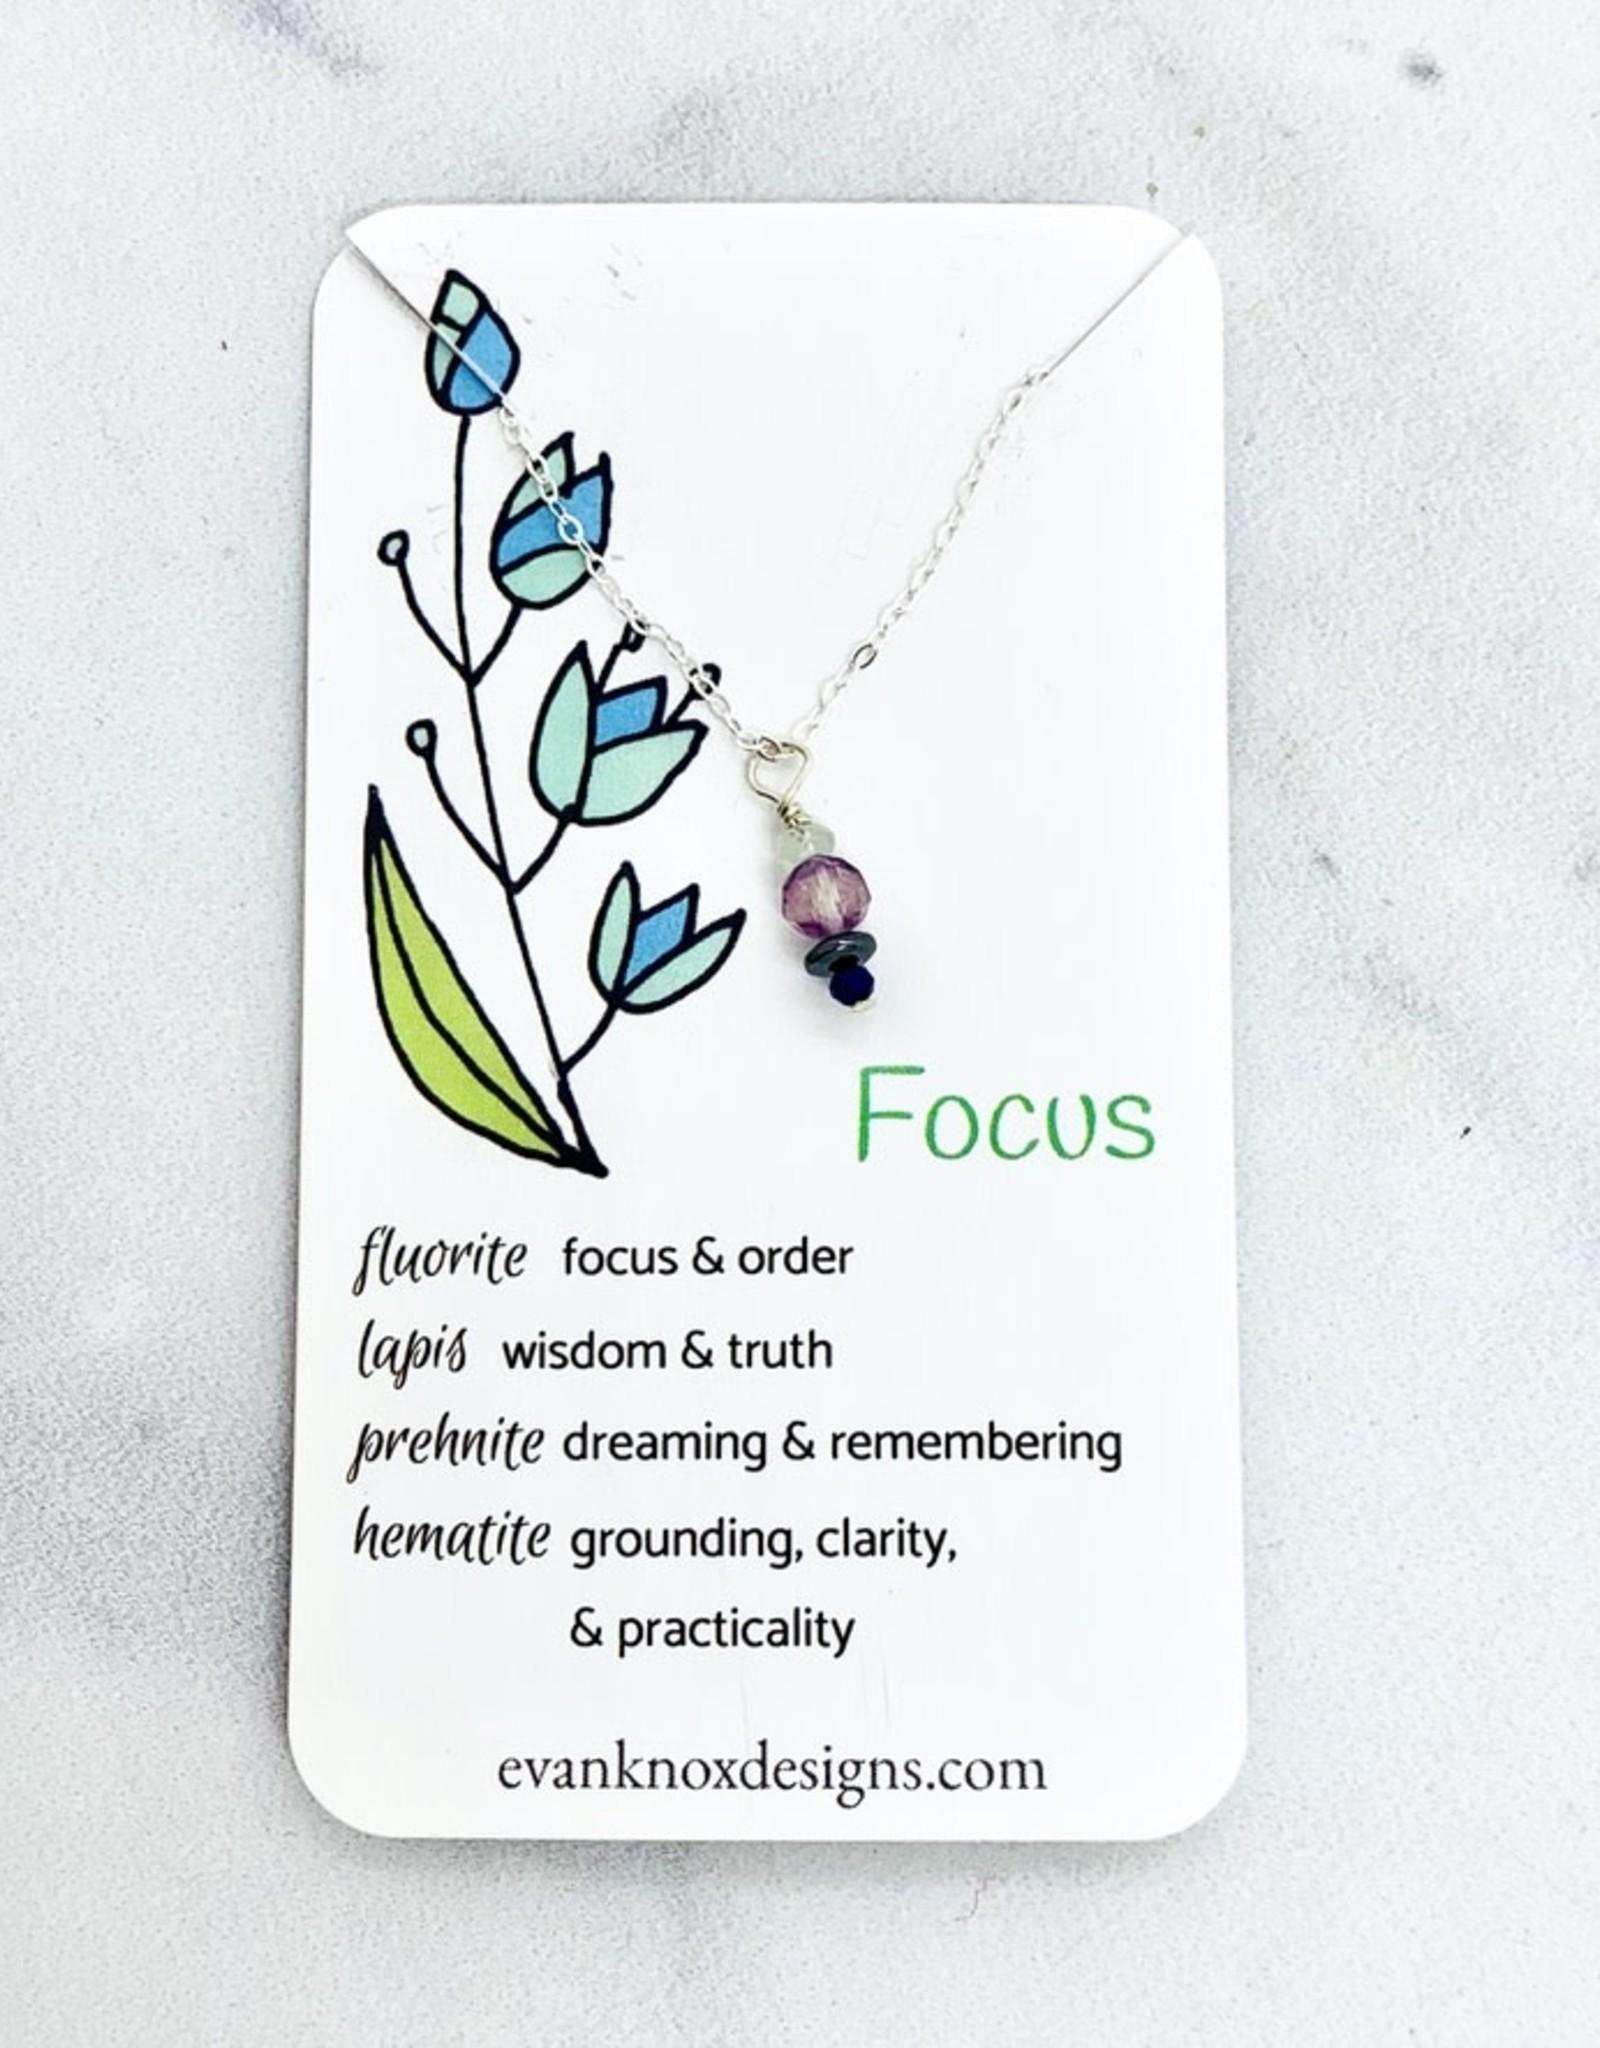 Handmade Silver Necklace with focus gemstones